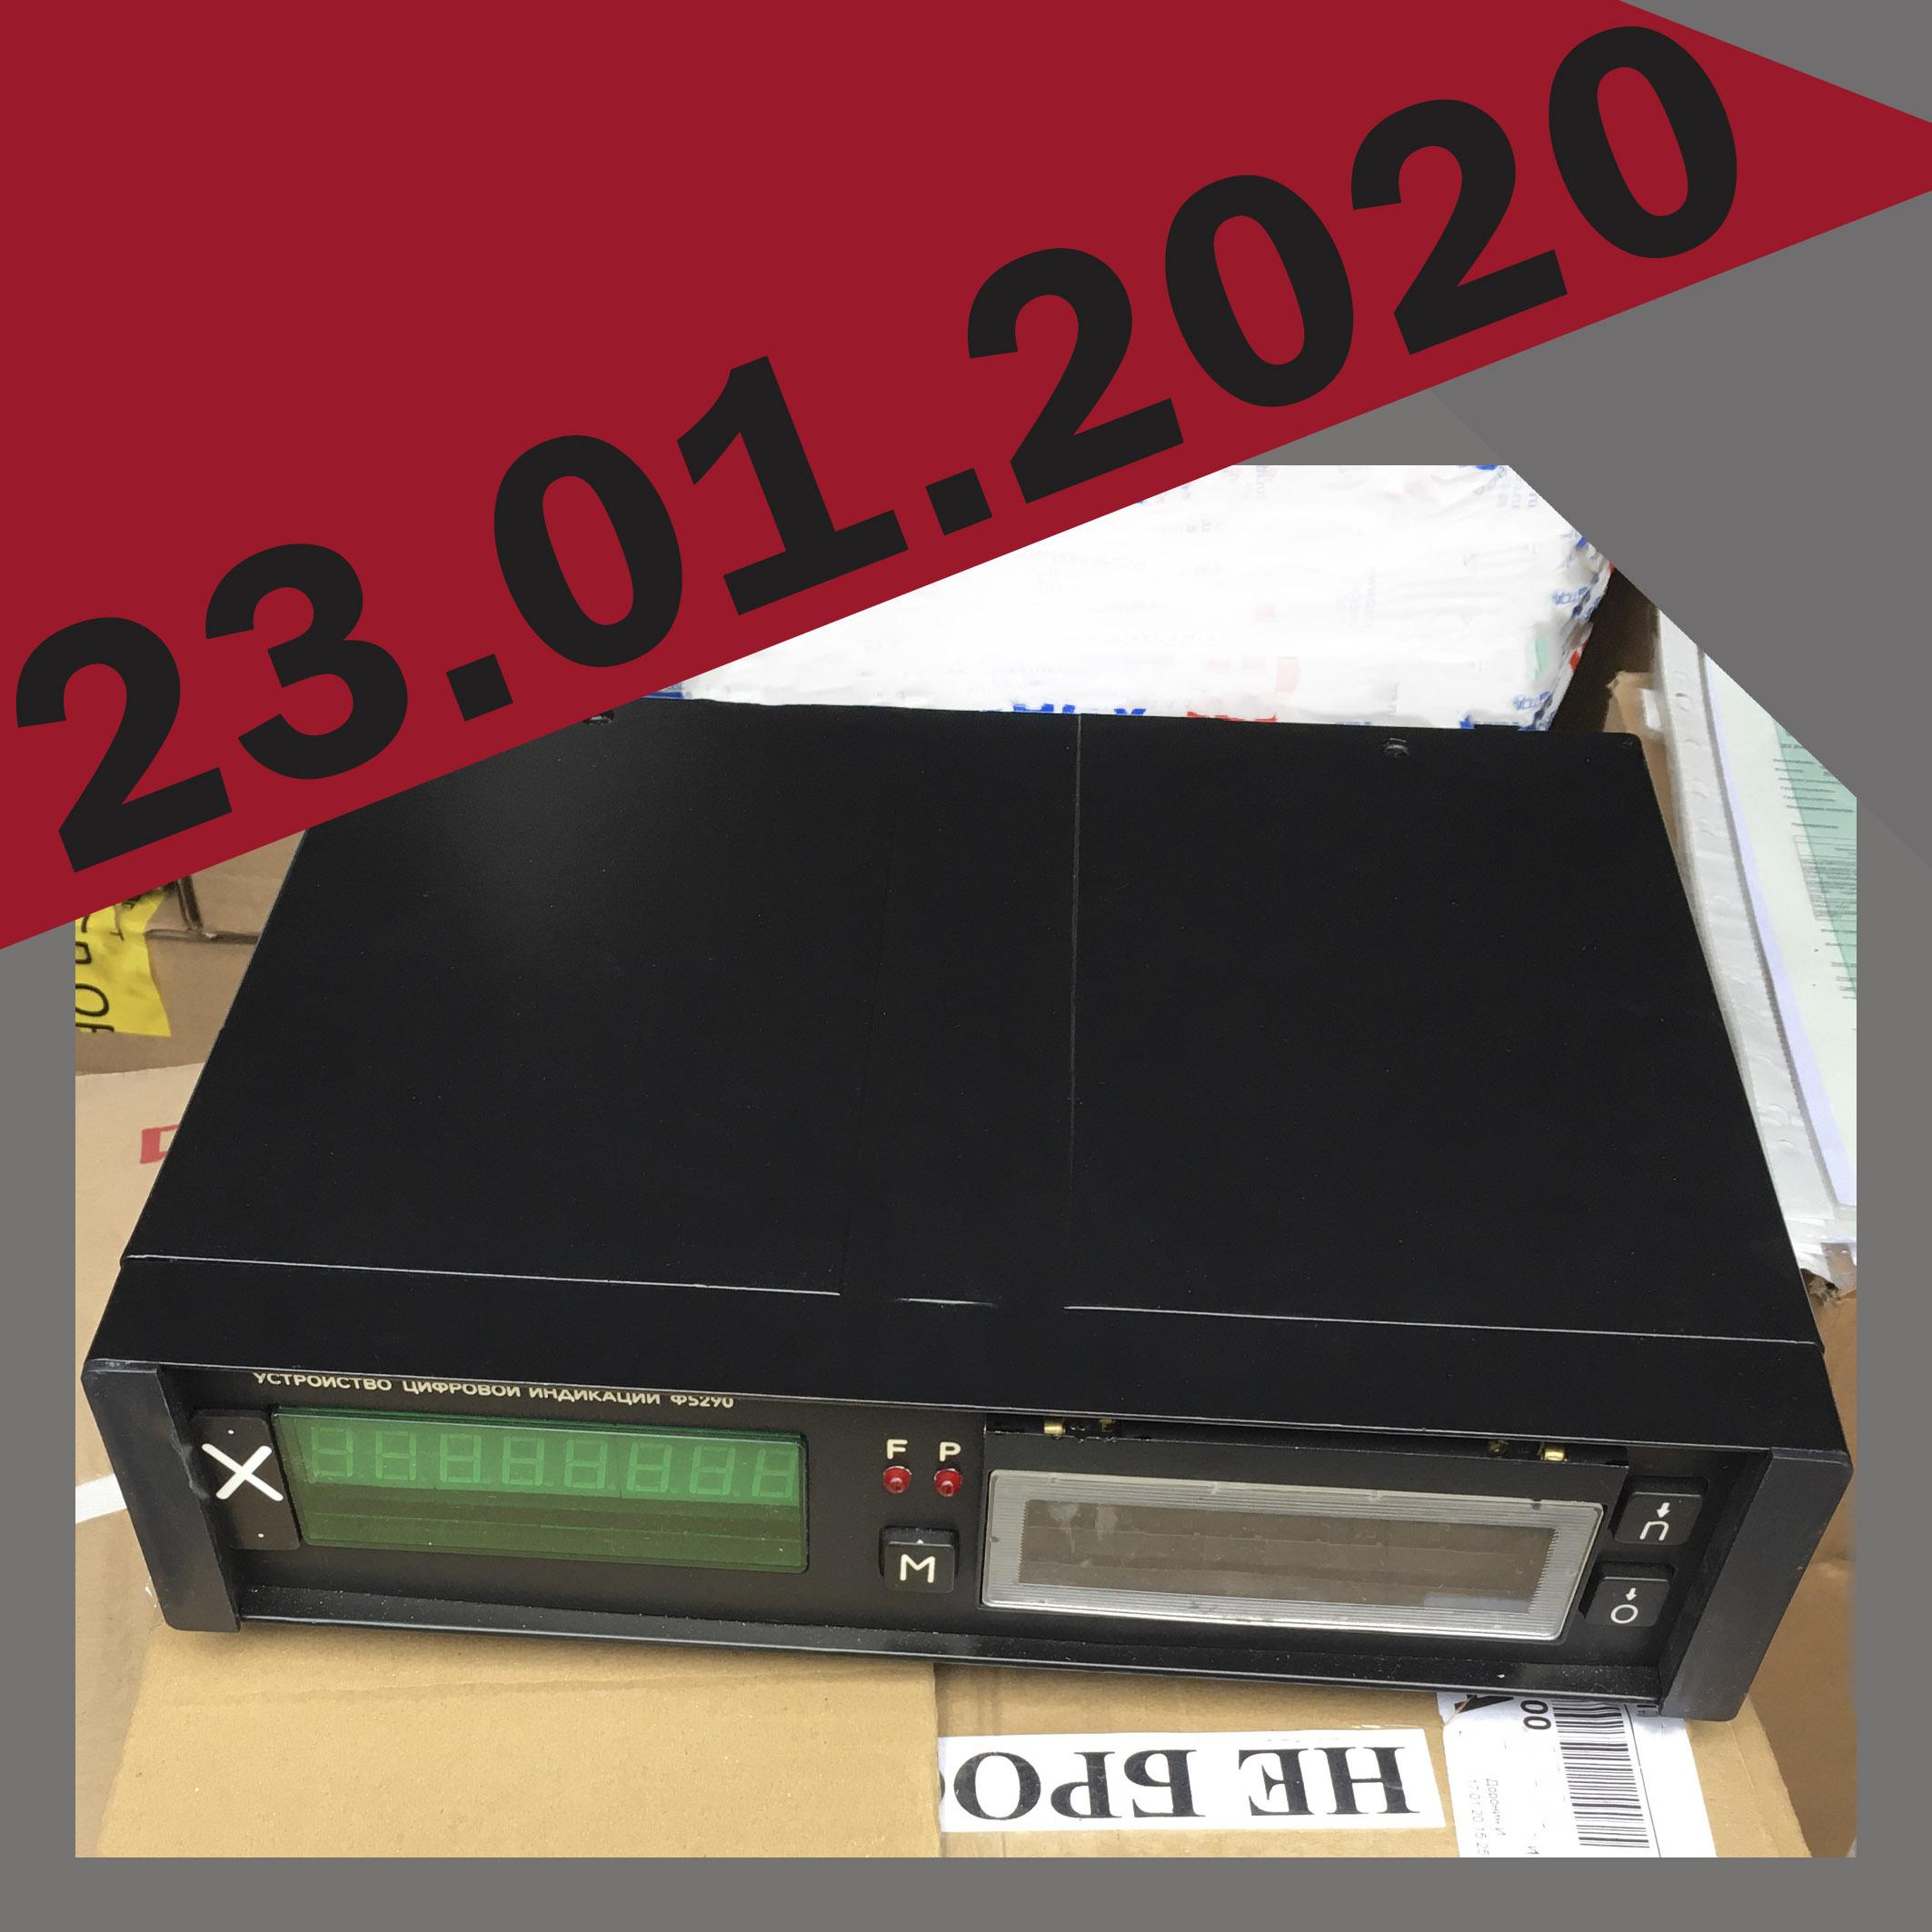 Устройство цифровой индикации УЦИ Ф5290